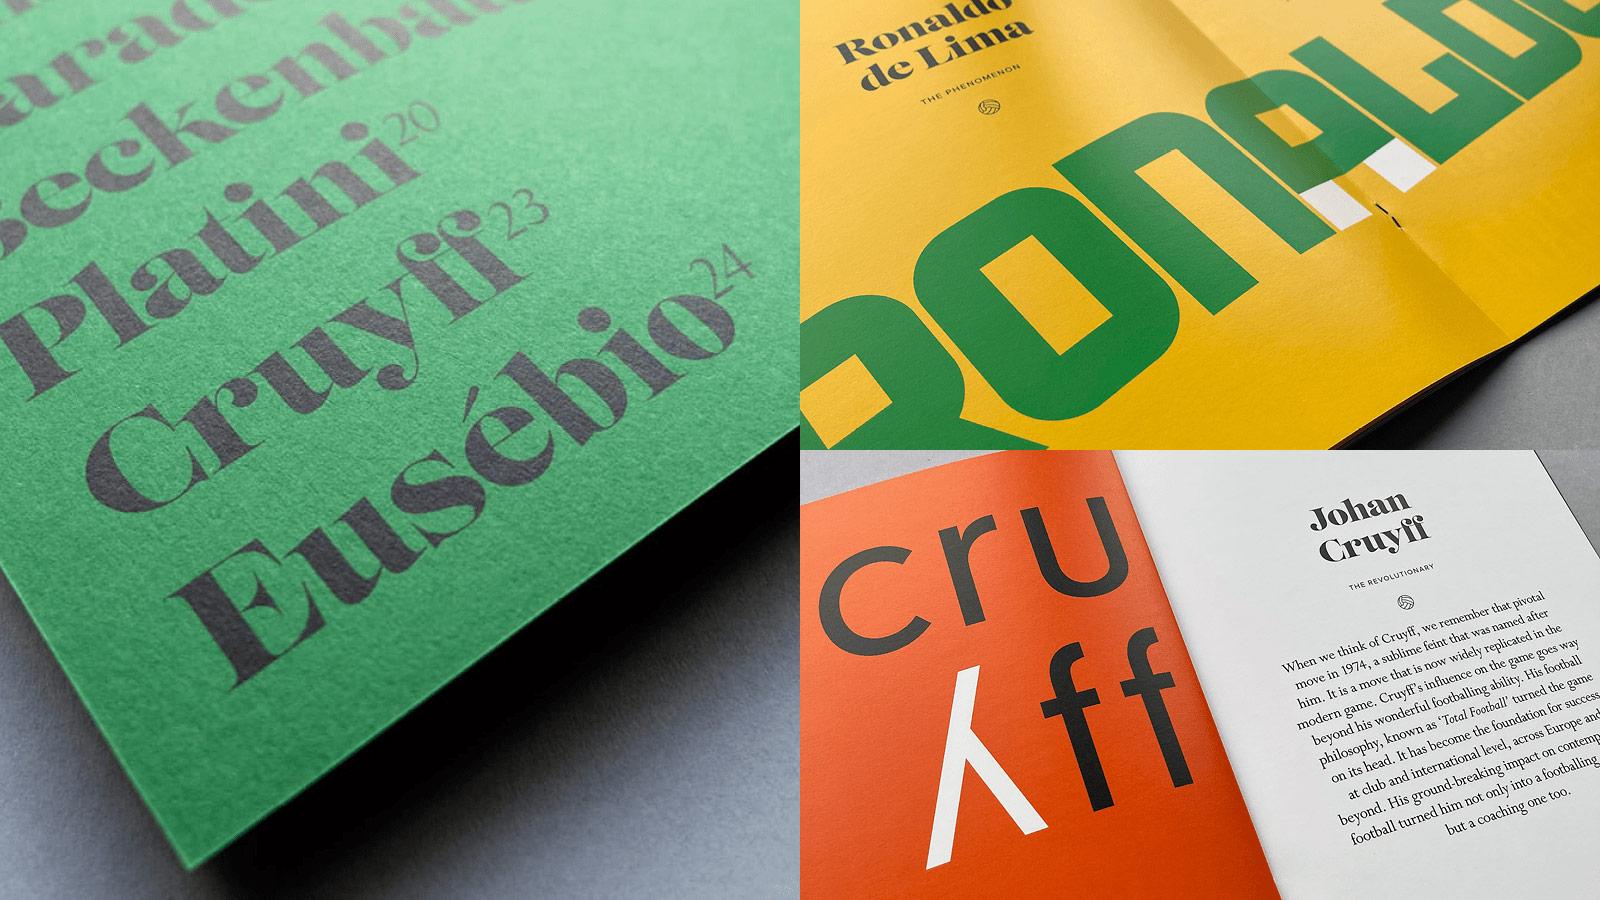 branding-identity-design-sport-football-graphics-dinkit-artwork-prints-posters-gallery-milton-keynes-london-10